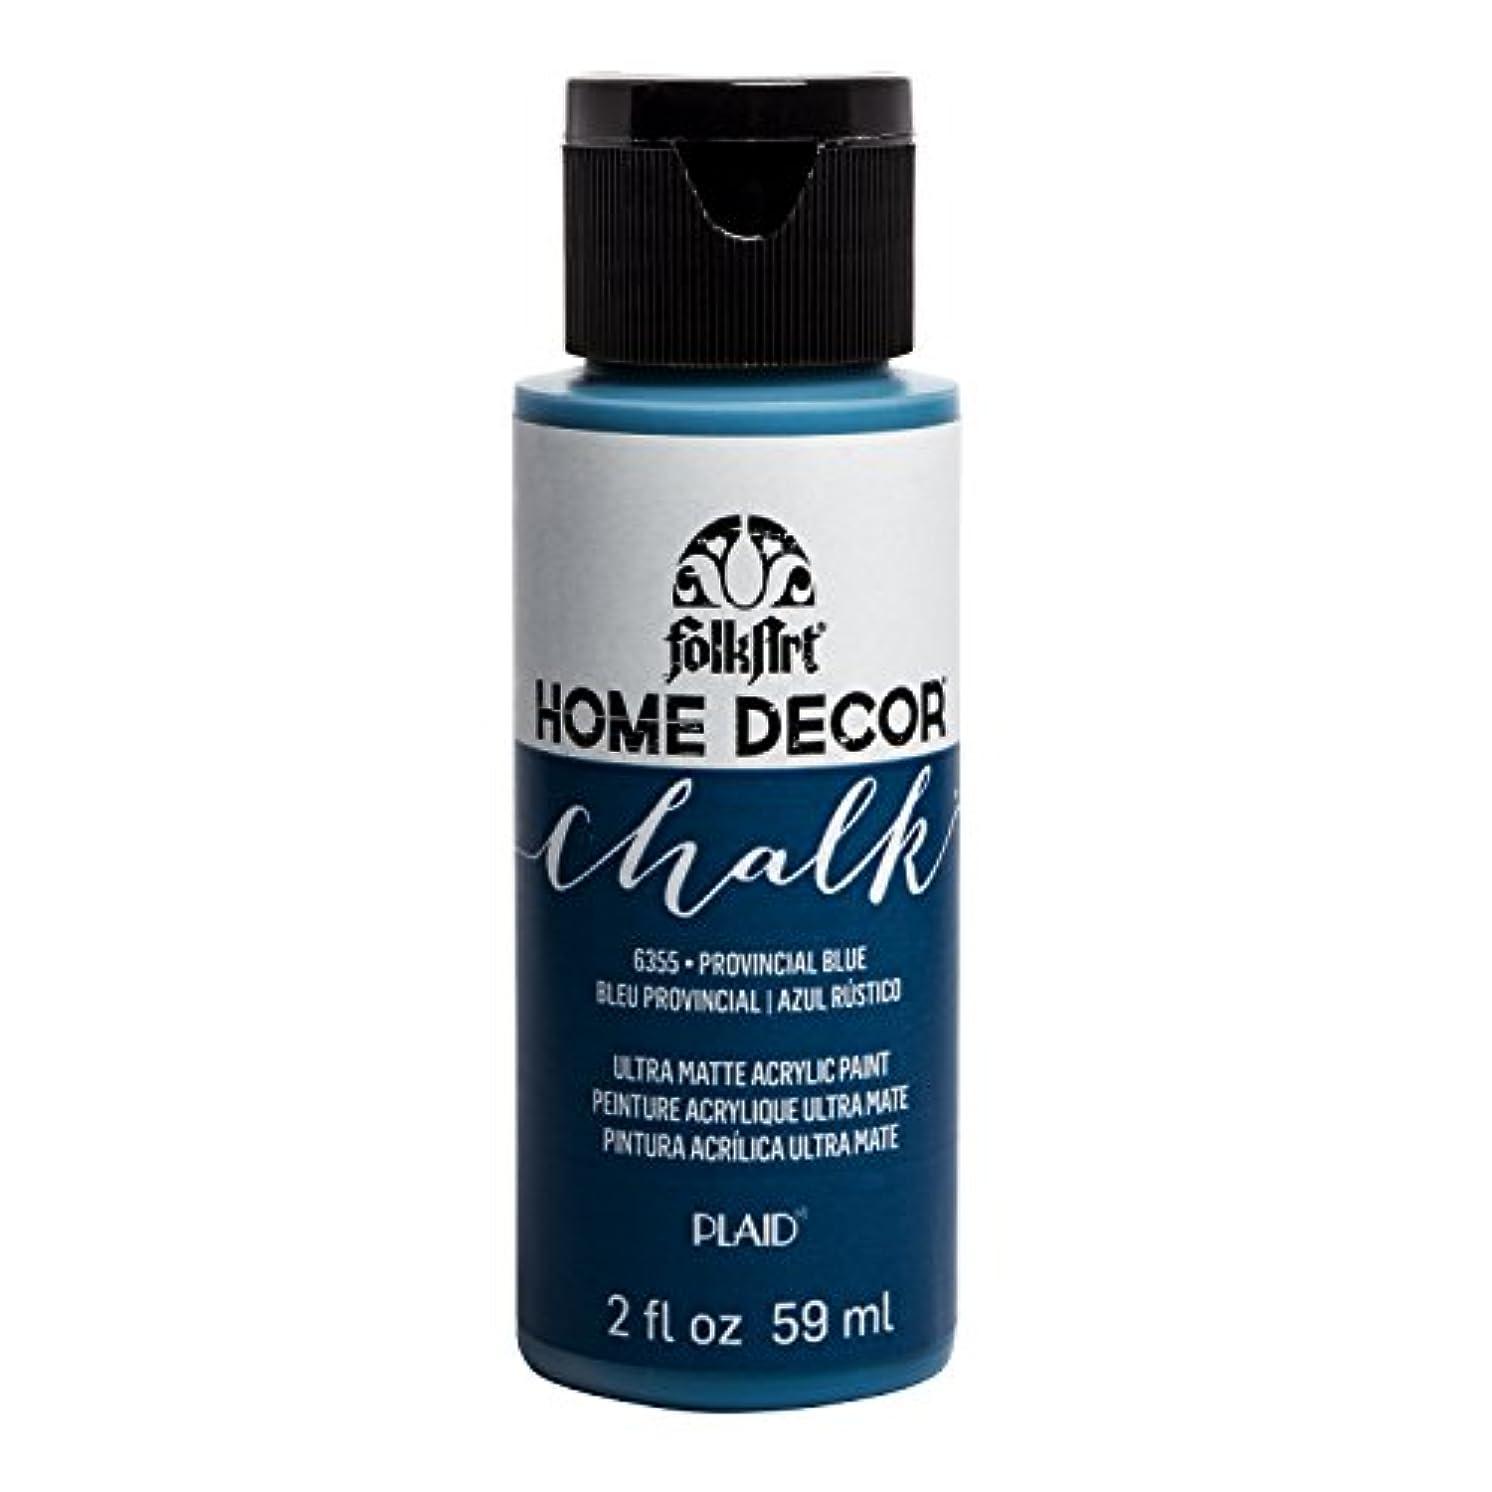 FolkArt 6355 Home Décor Chalk Acrylic Paint, 2oz, Provincial Blue